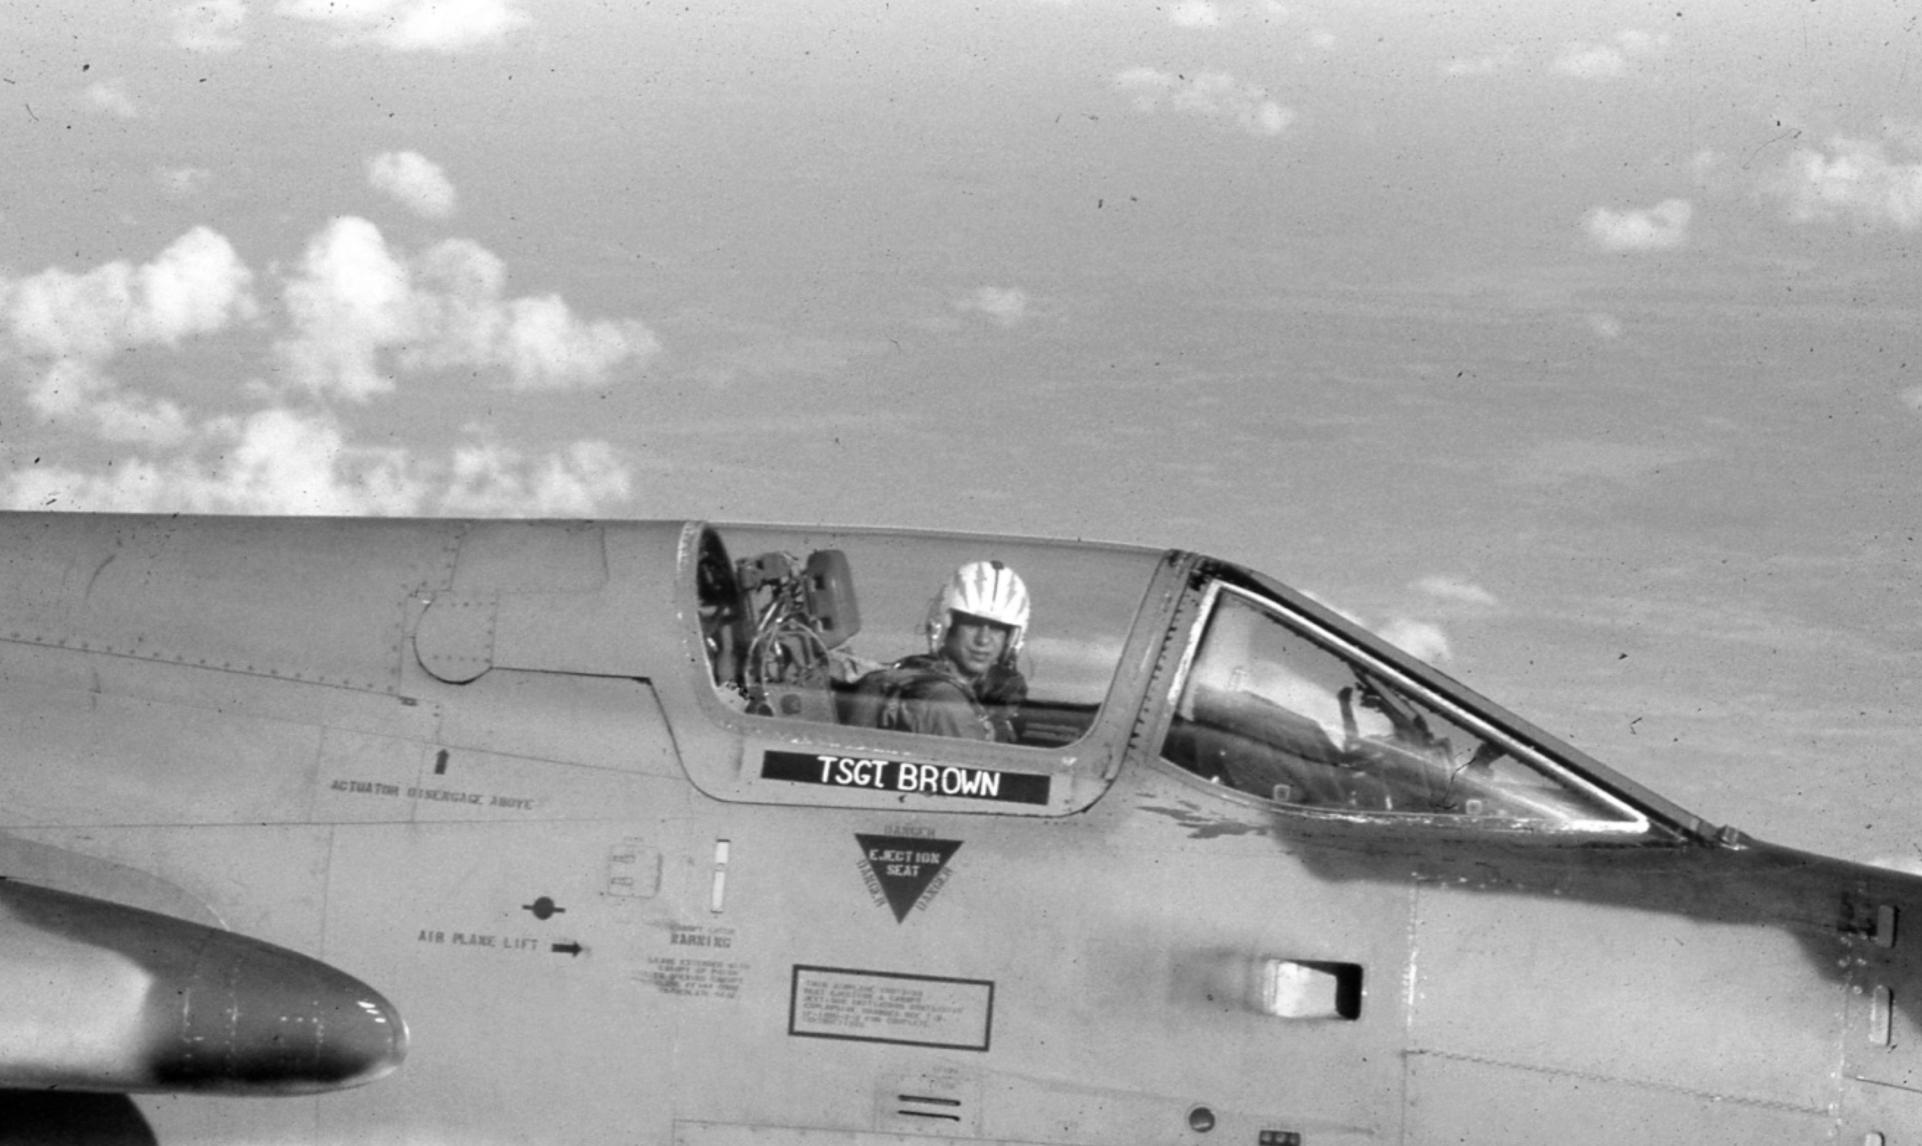 Airmen TSGT Brown